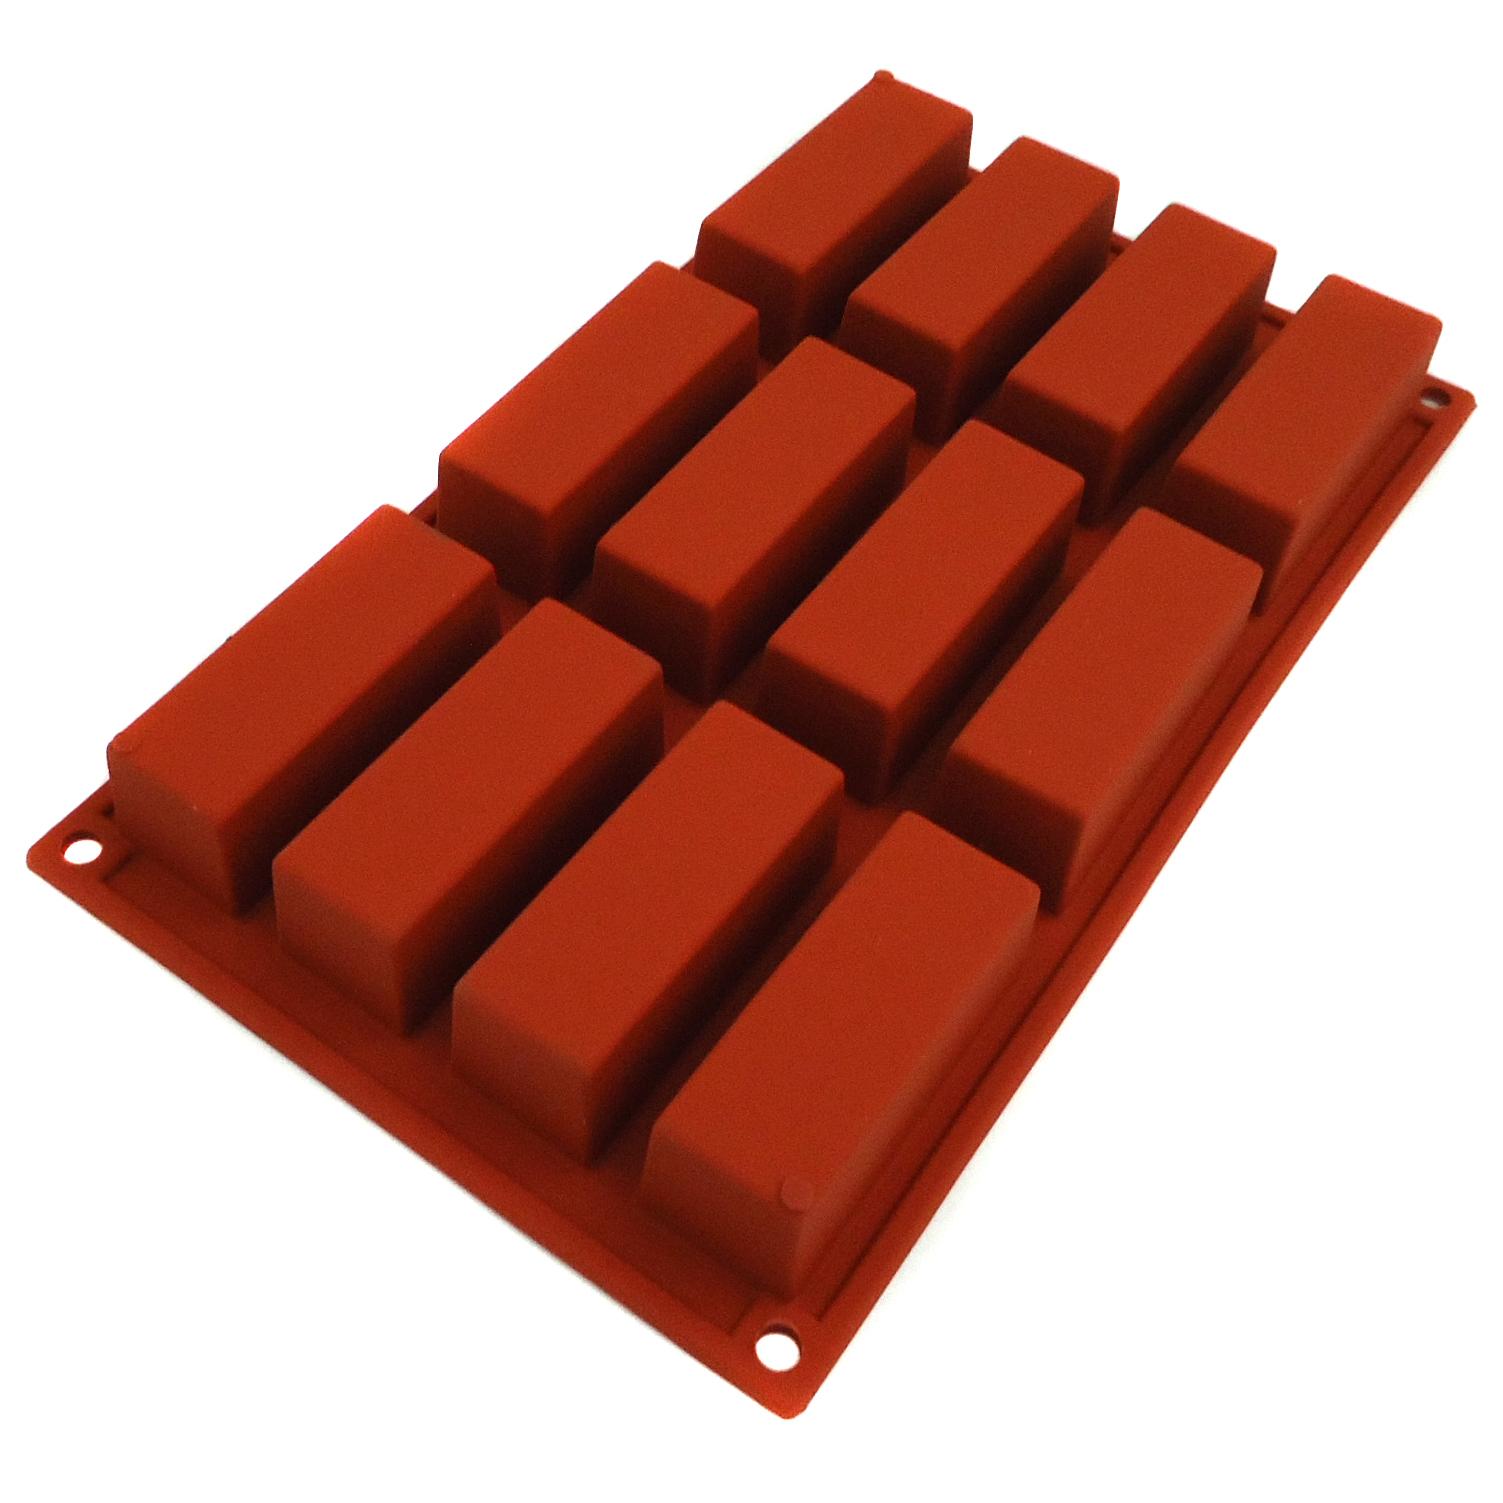 Lacor 66826 Αντικολλητικές Φόρμες Σιλικόνης Κέικ 12 Θέσεων - 80x30x30mm επαγγελματικός εξοπλισμός   επαγγελματικά σκεύη είδη σερβιρίσματος   εξαρτήματα